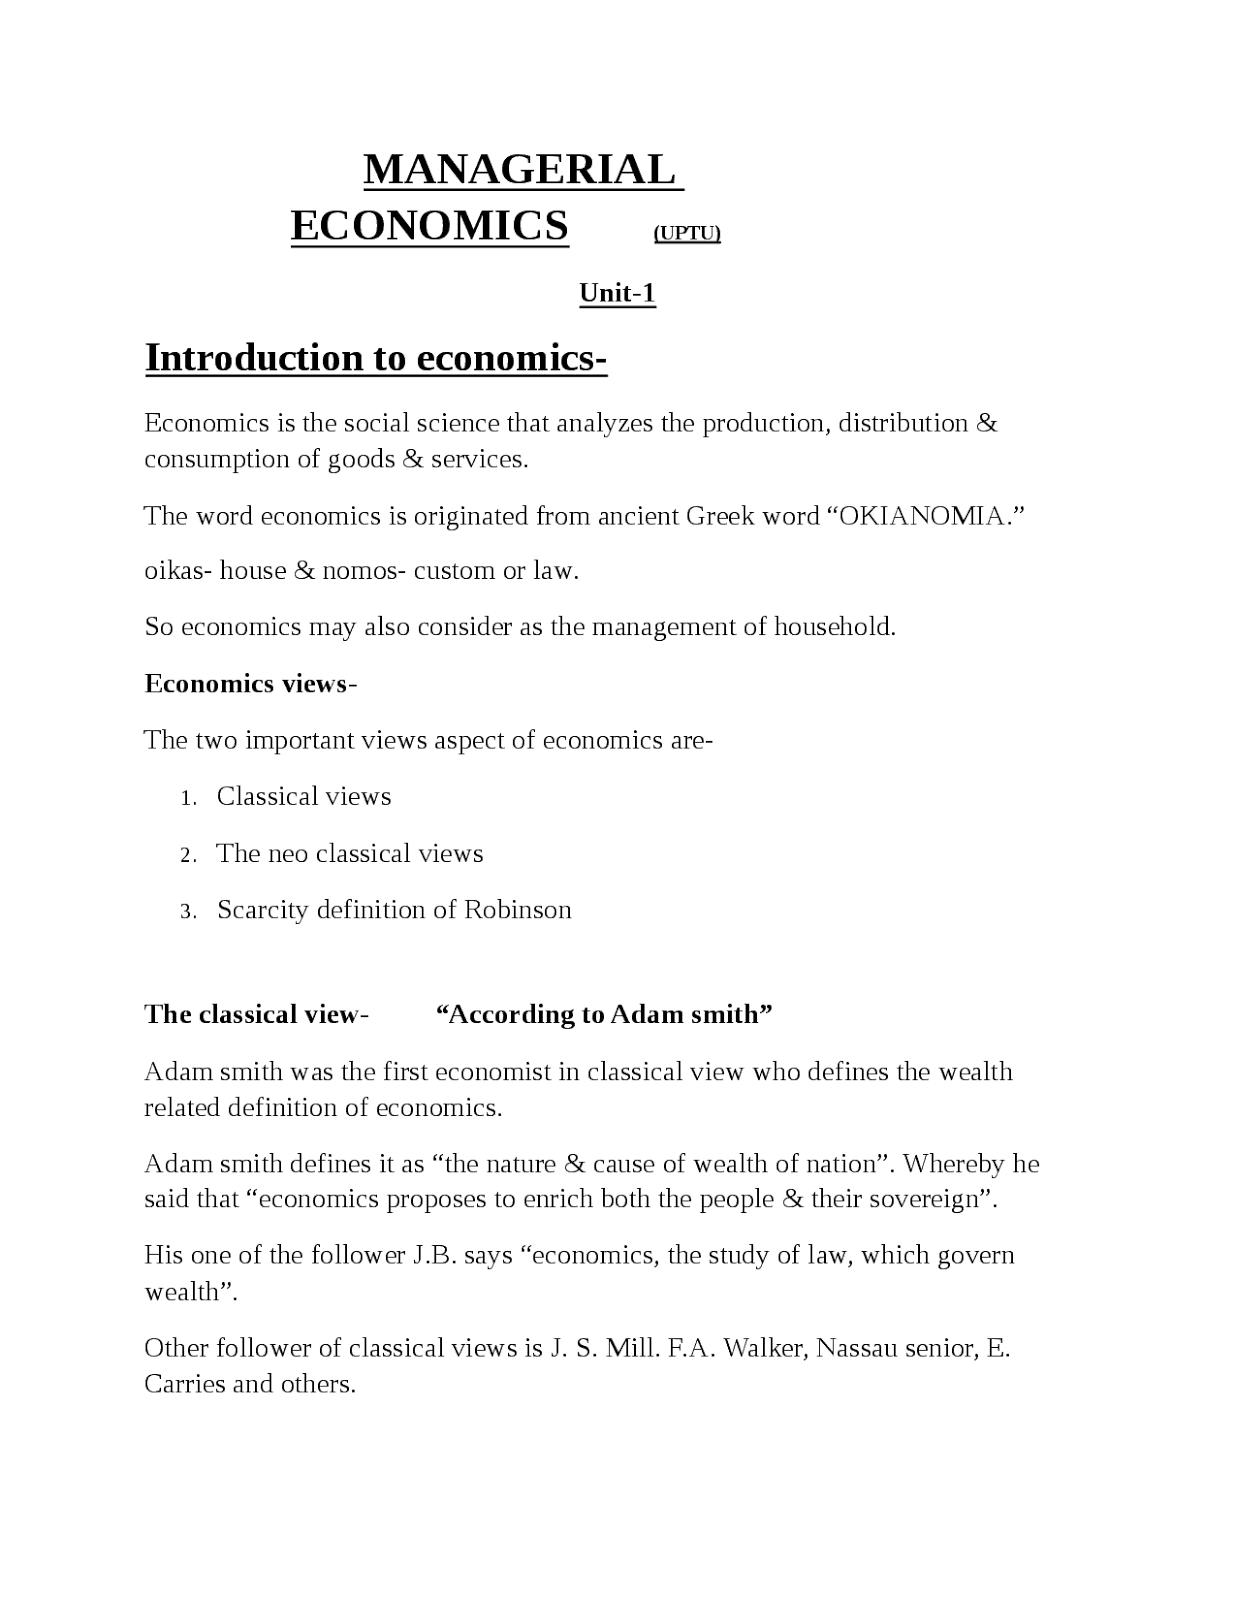 How to buy a car essay